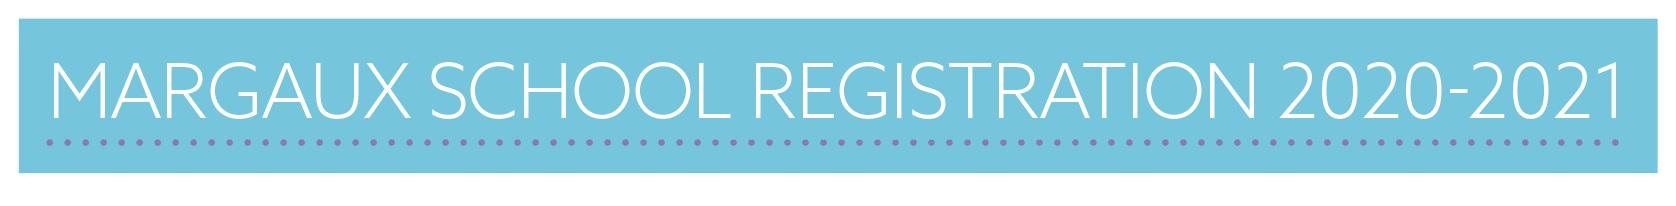 Margaux School Registration 2020 2021 – Form – Temple Judea In Oregon City High School Calendar 2021